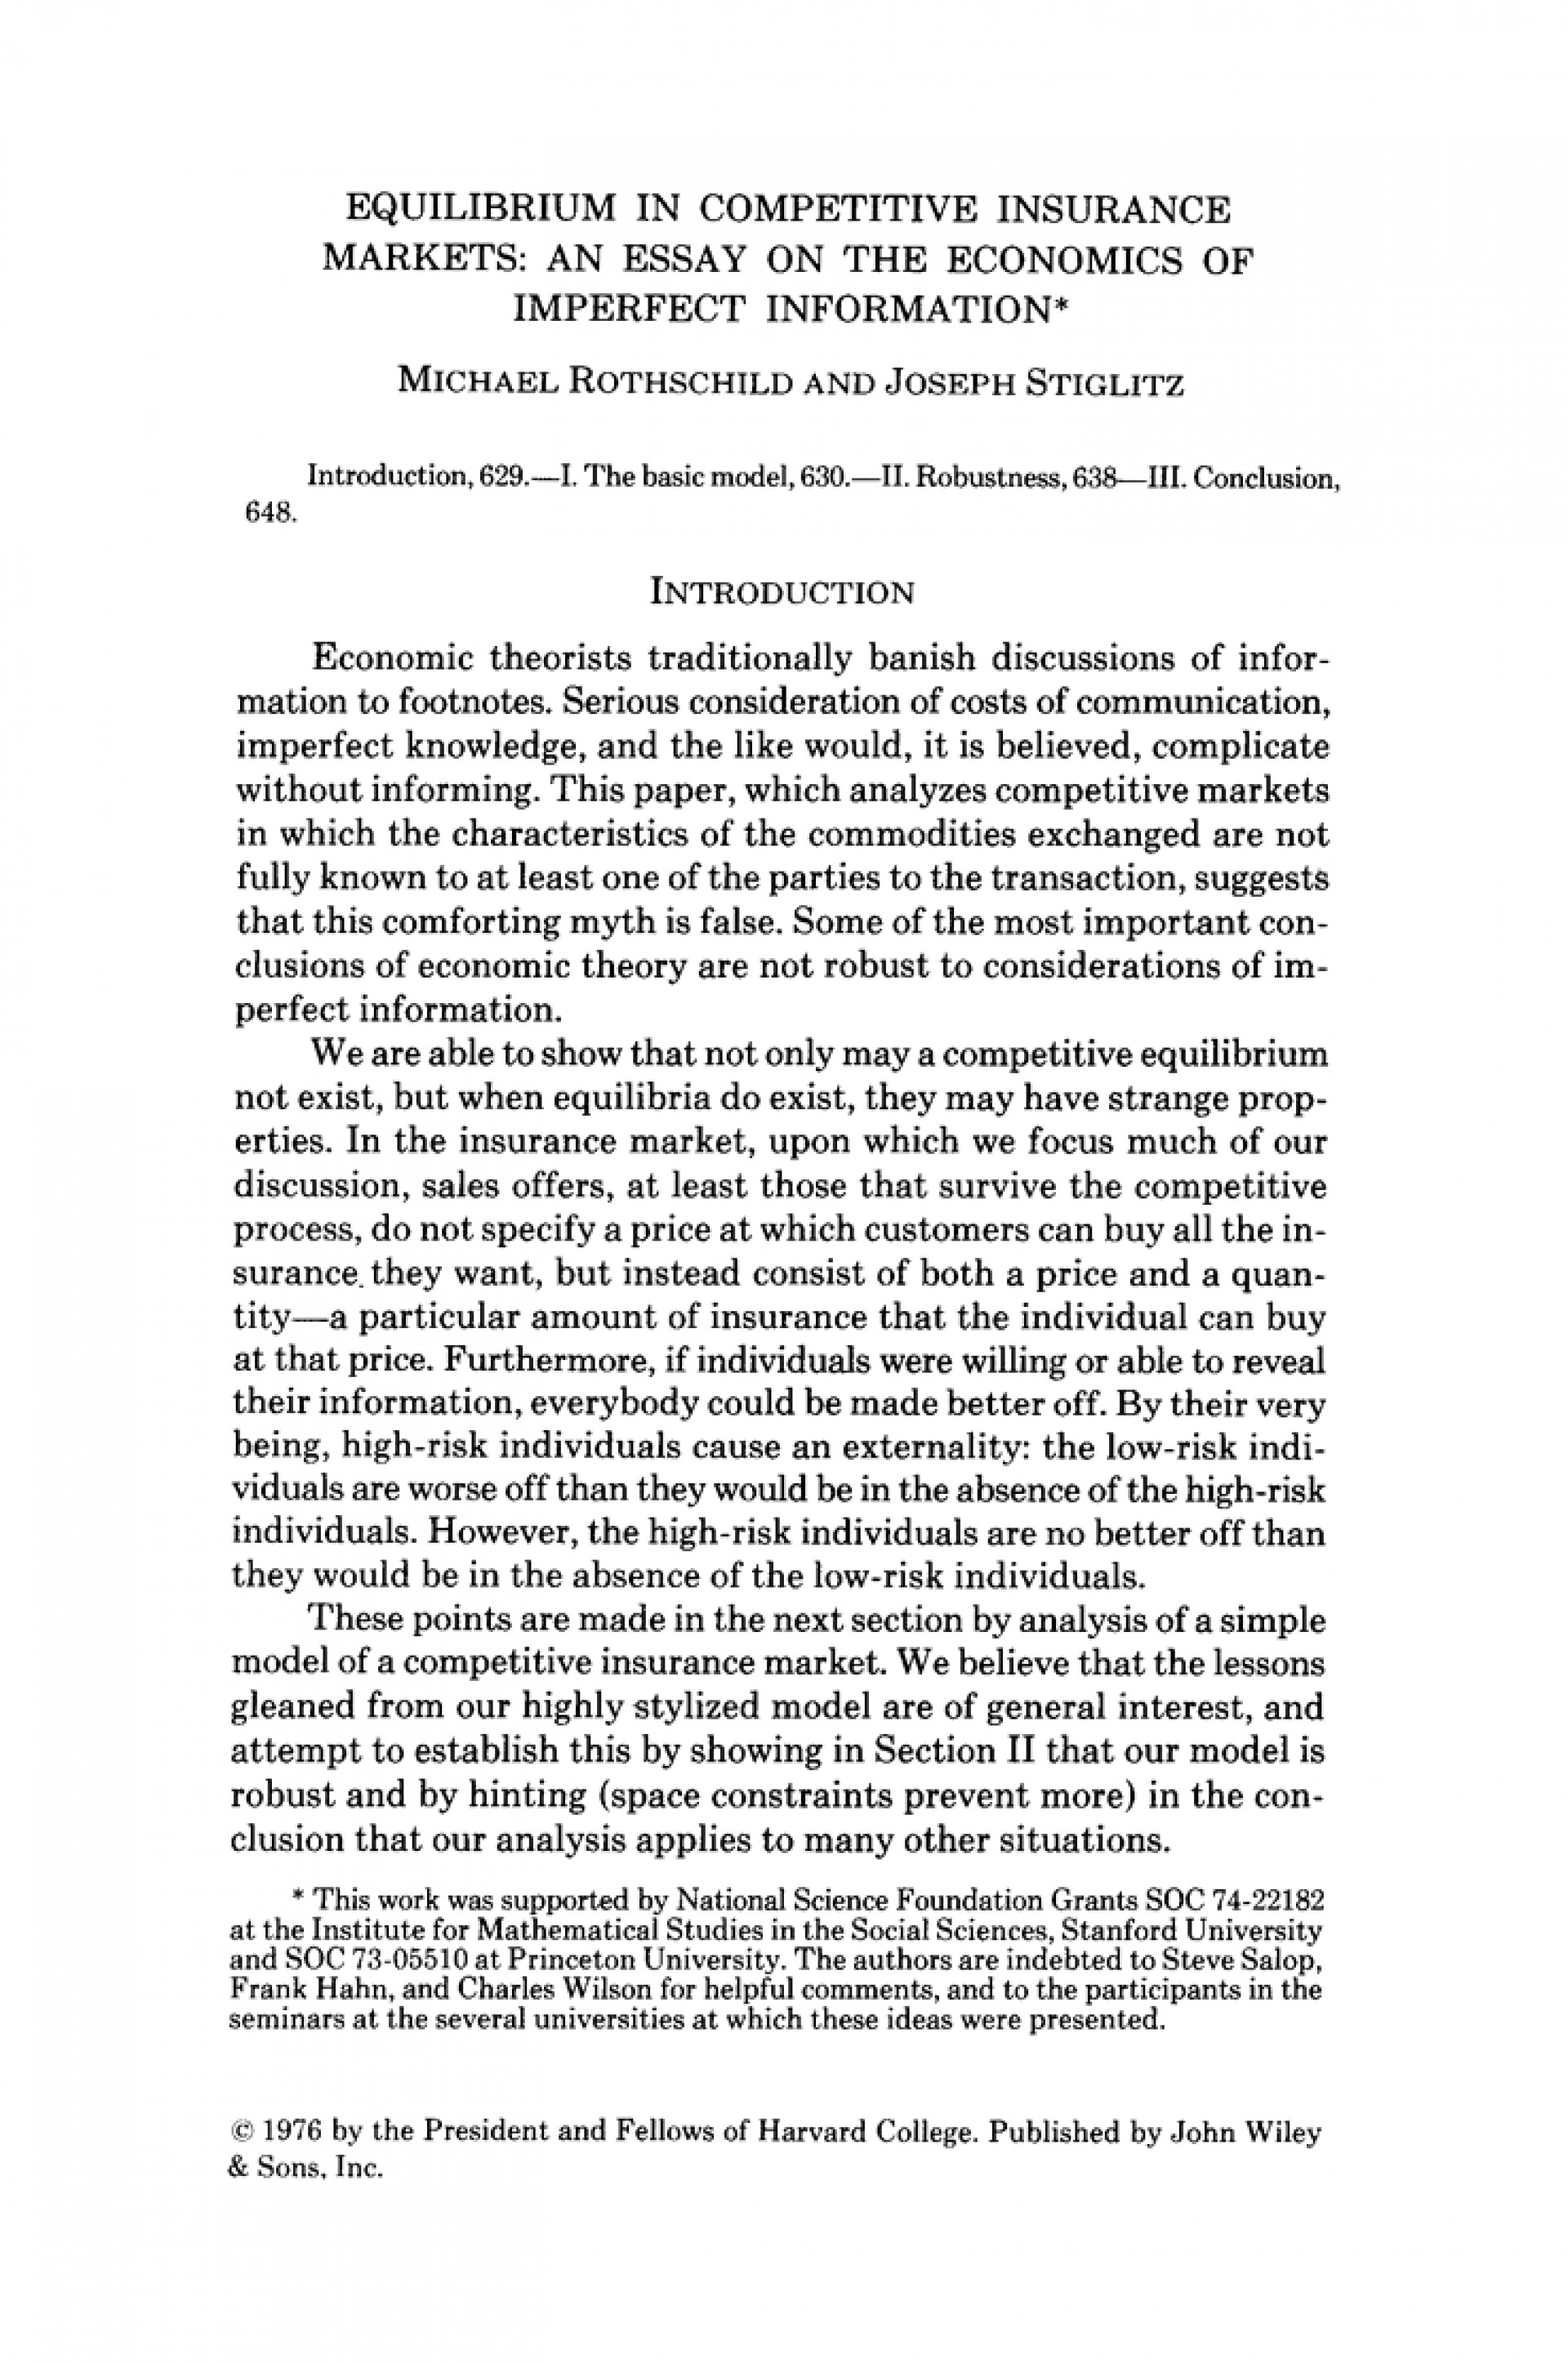 010 Childhood Memory Essay Example Descriptive About Memories My L Top Ideas Earliest 1920